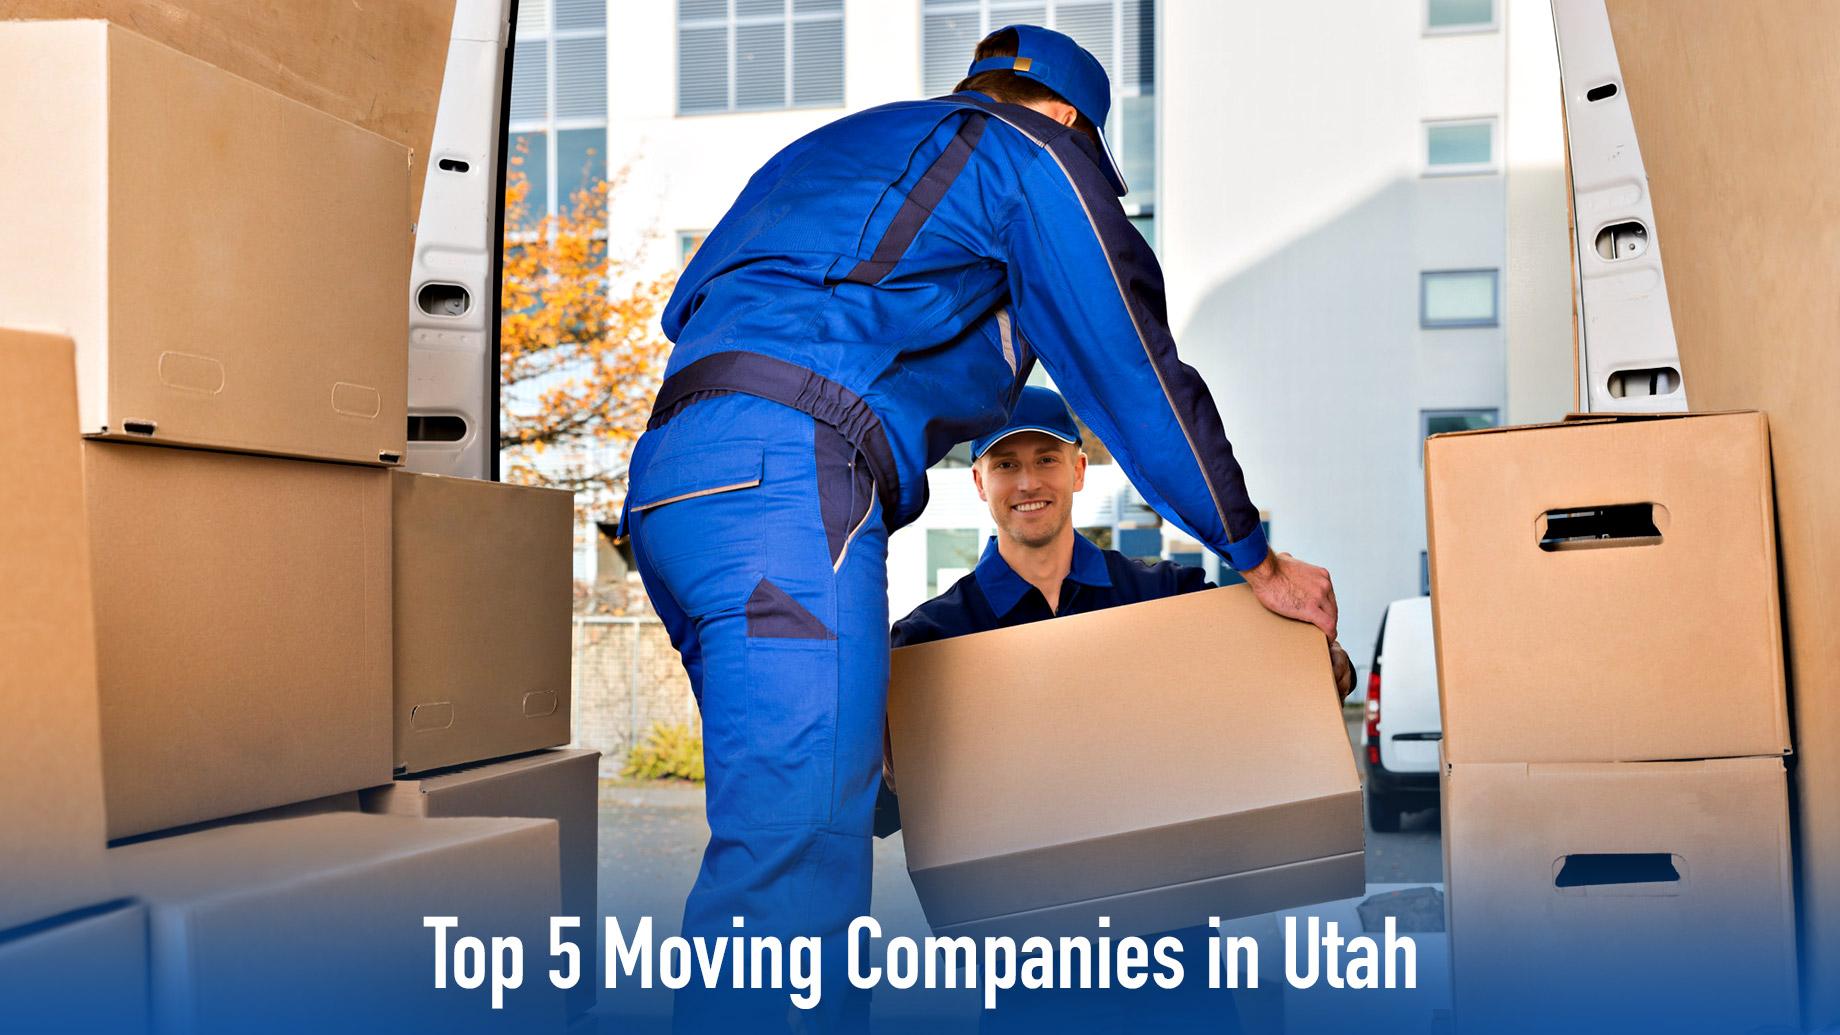 Top 5 Moving Companies in Utah